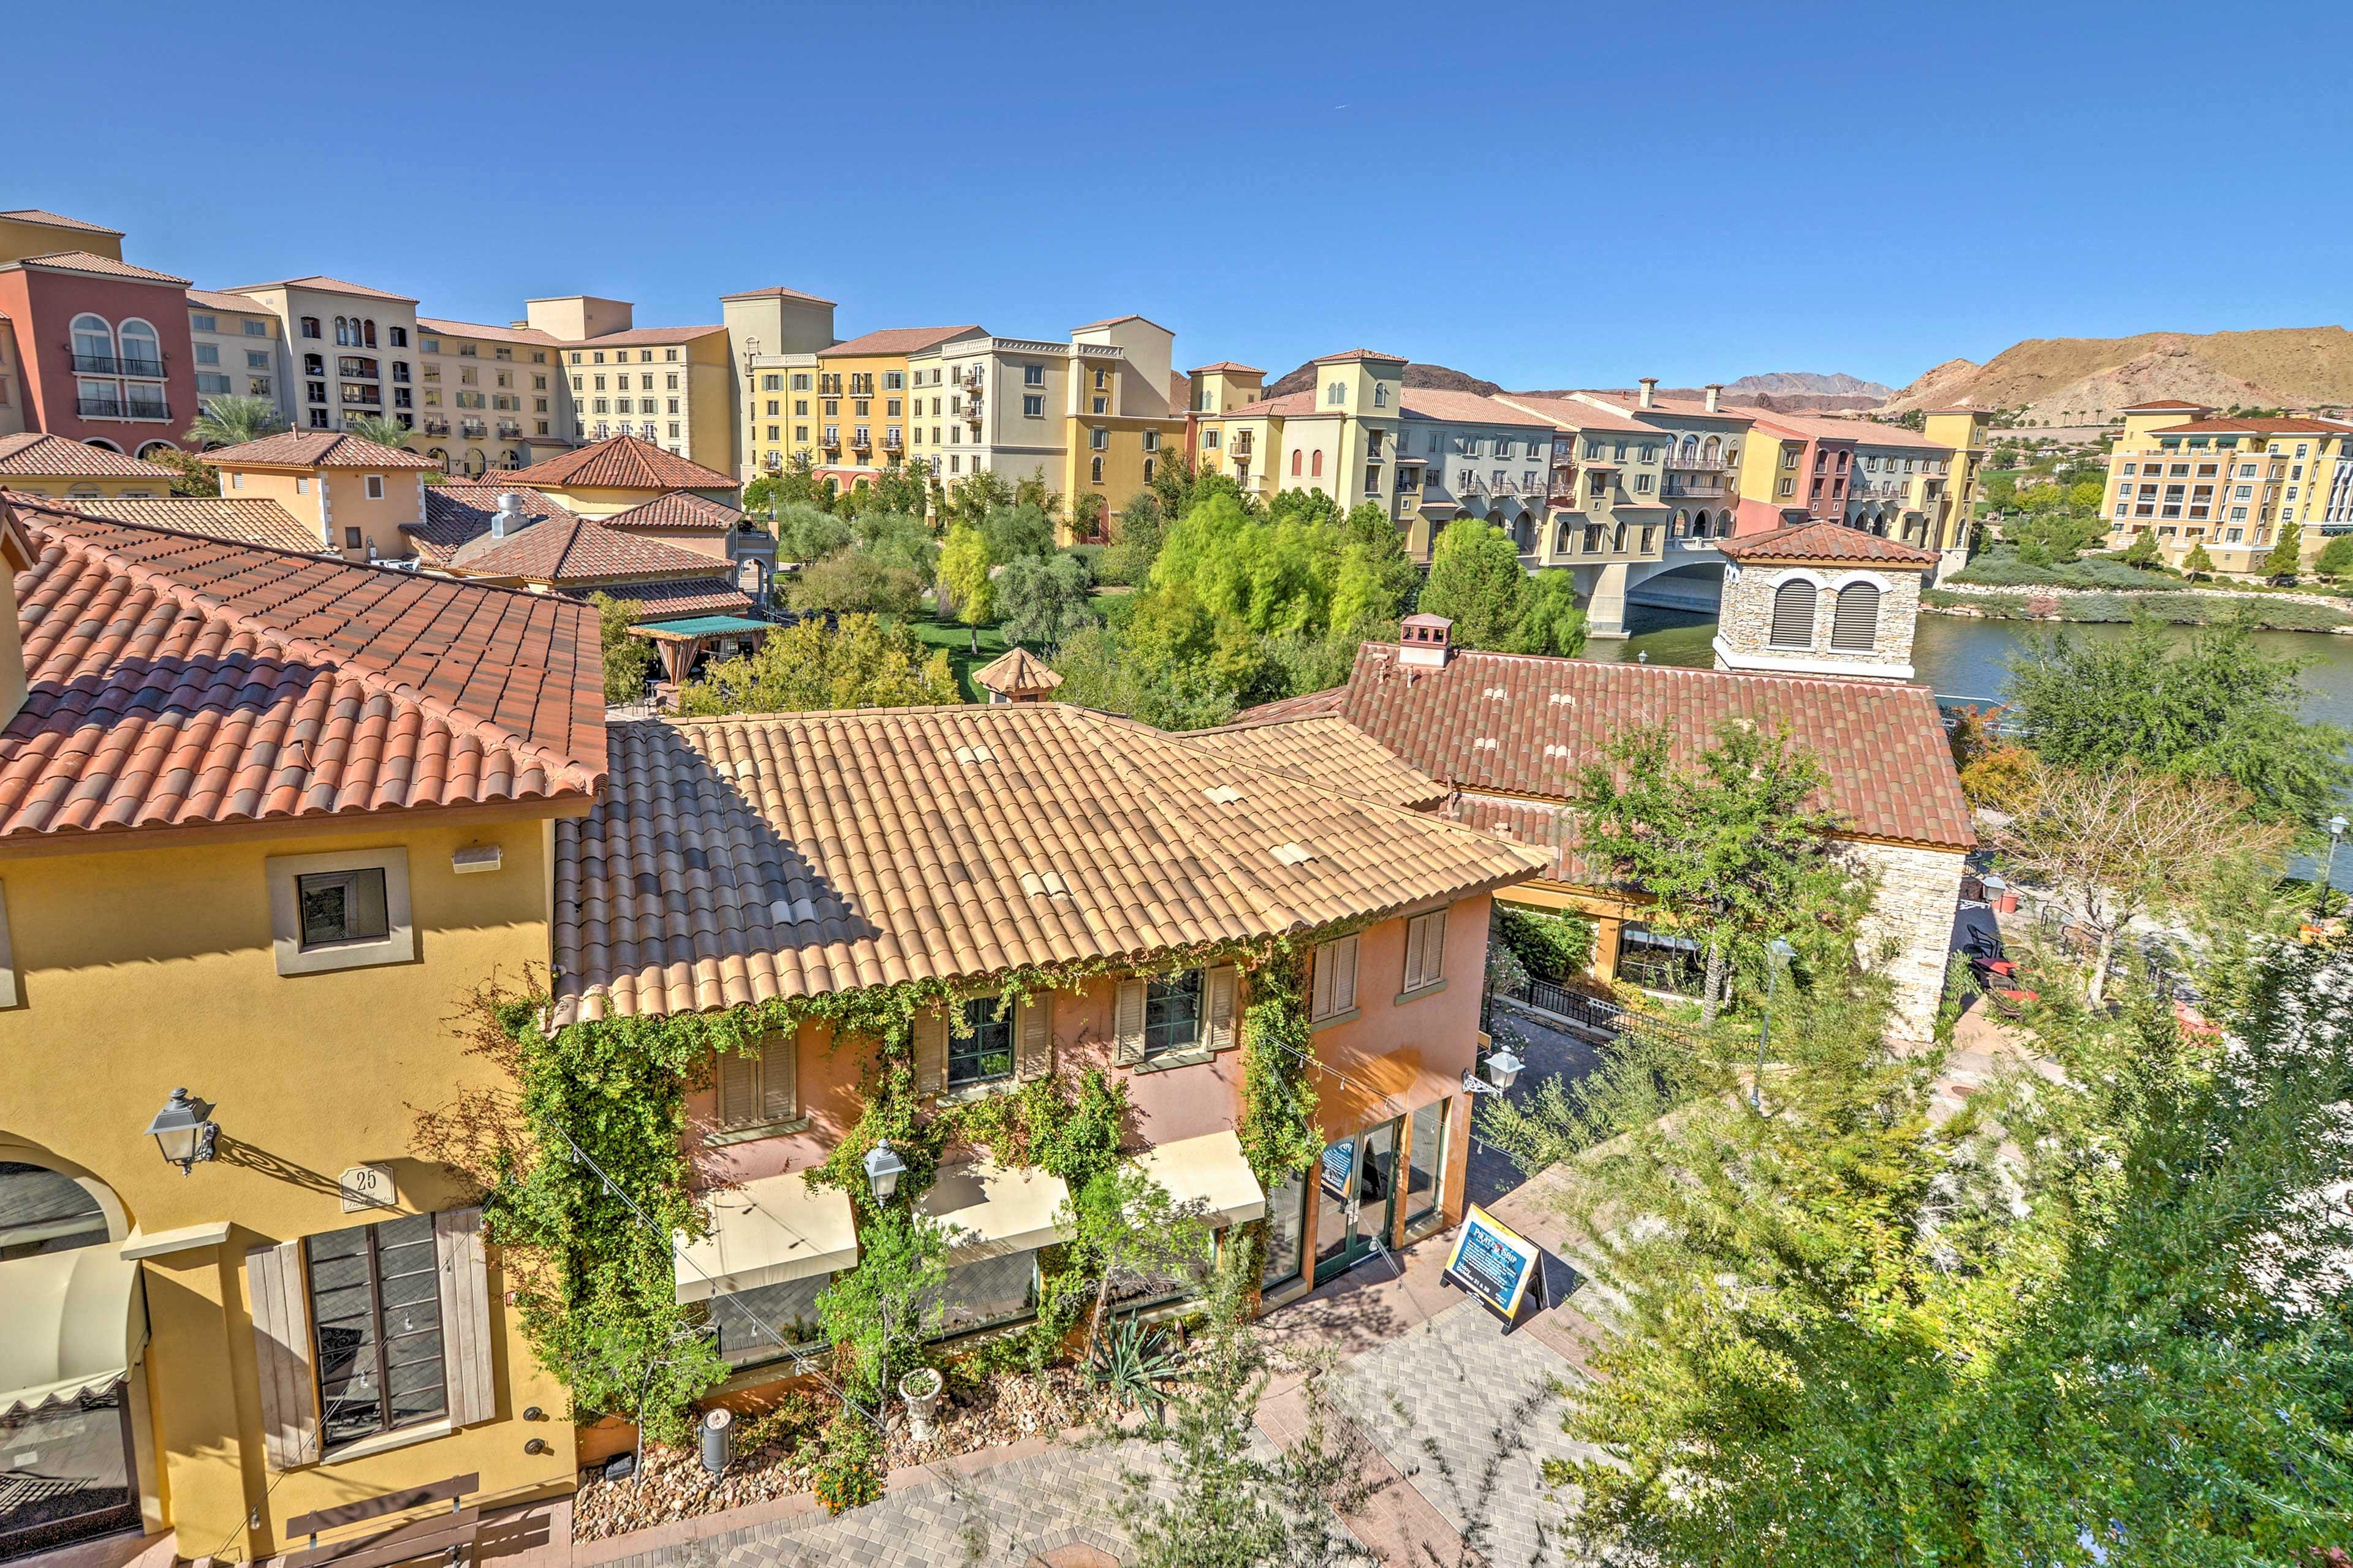 Enjoy the magical balcony view of the 'Ponte Vecchio' bridge replica.